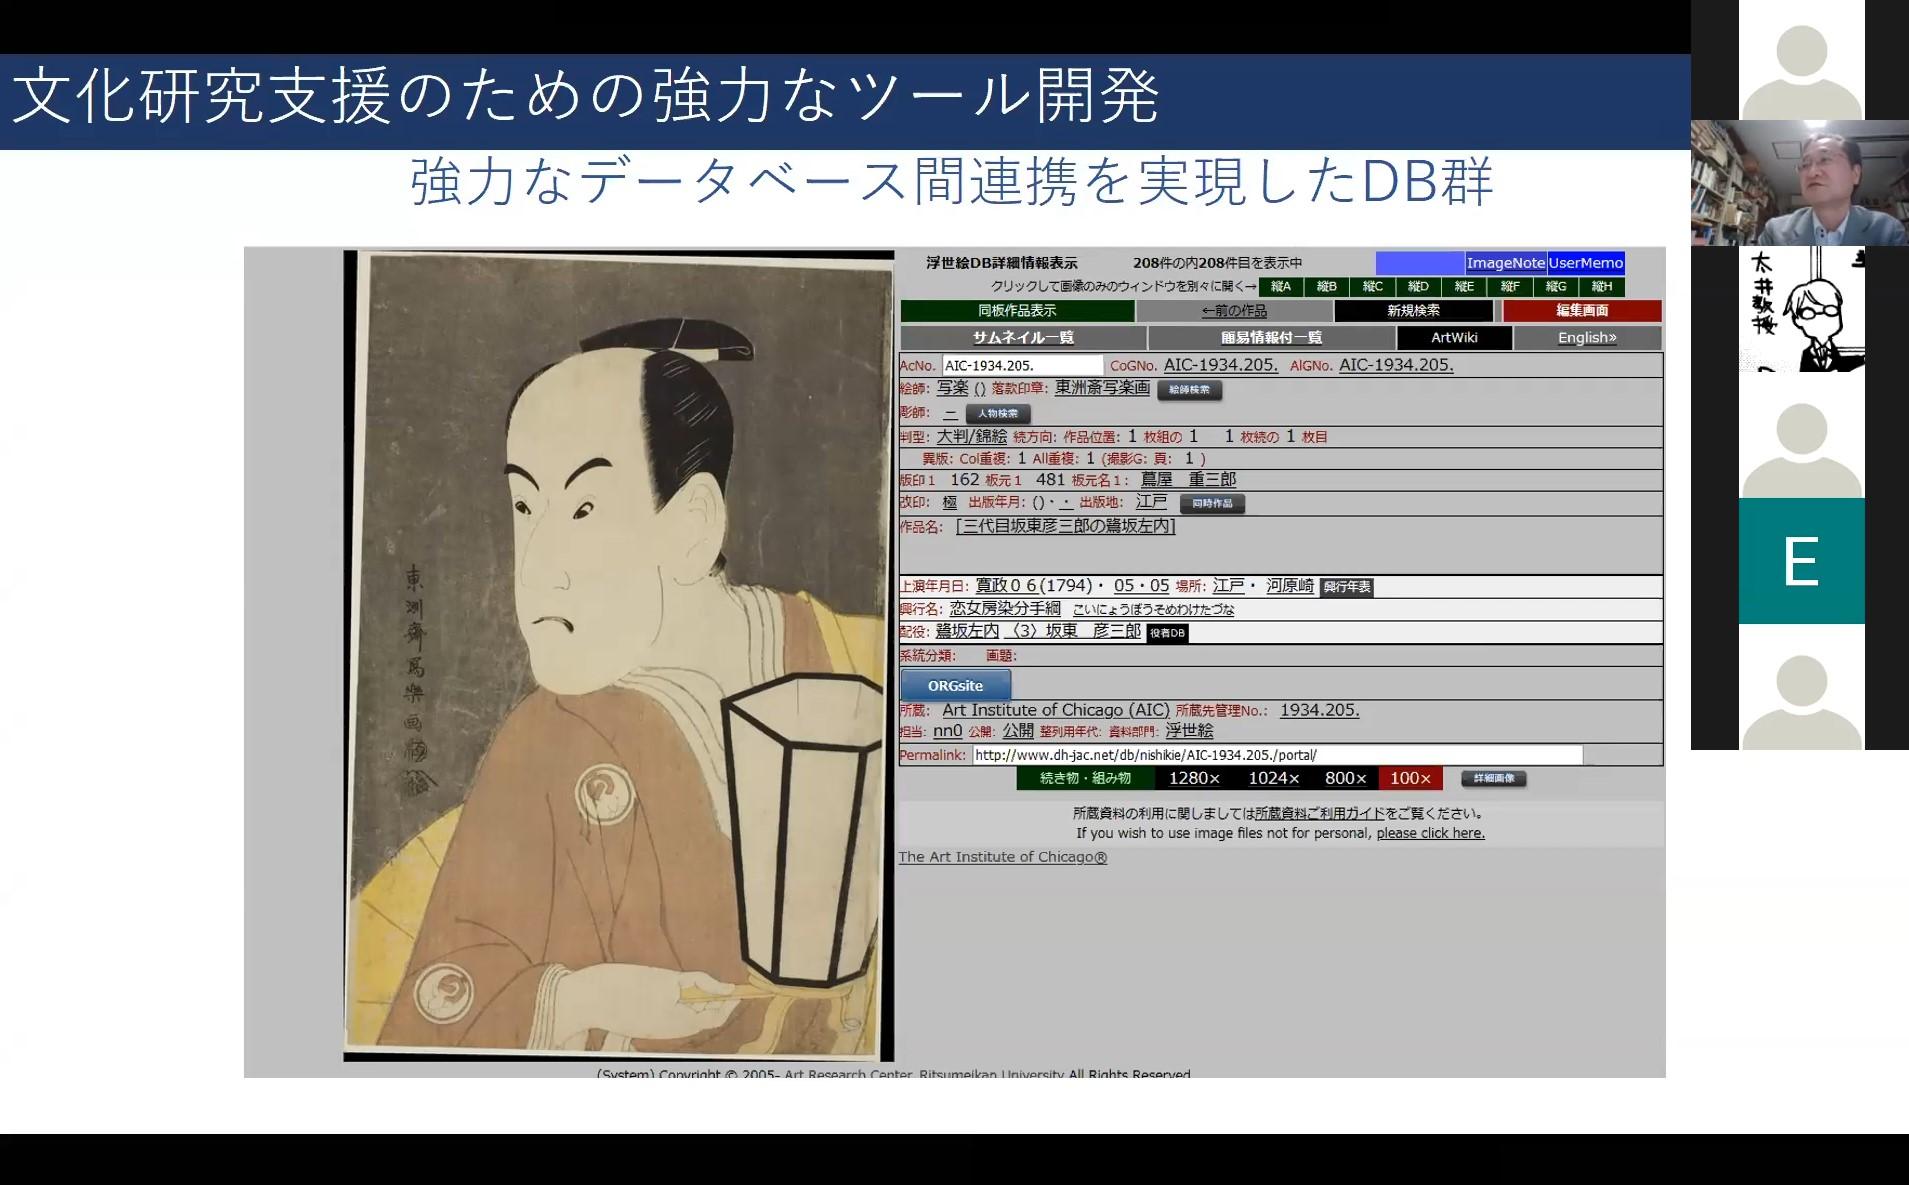 https://www.arc.ritsumei.ac.jp/lib/app/newarc/news/akama_sensei.jpg